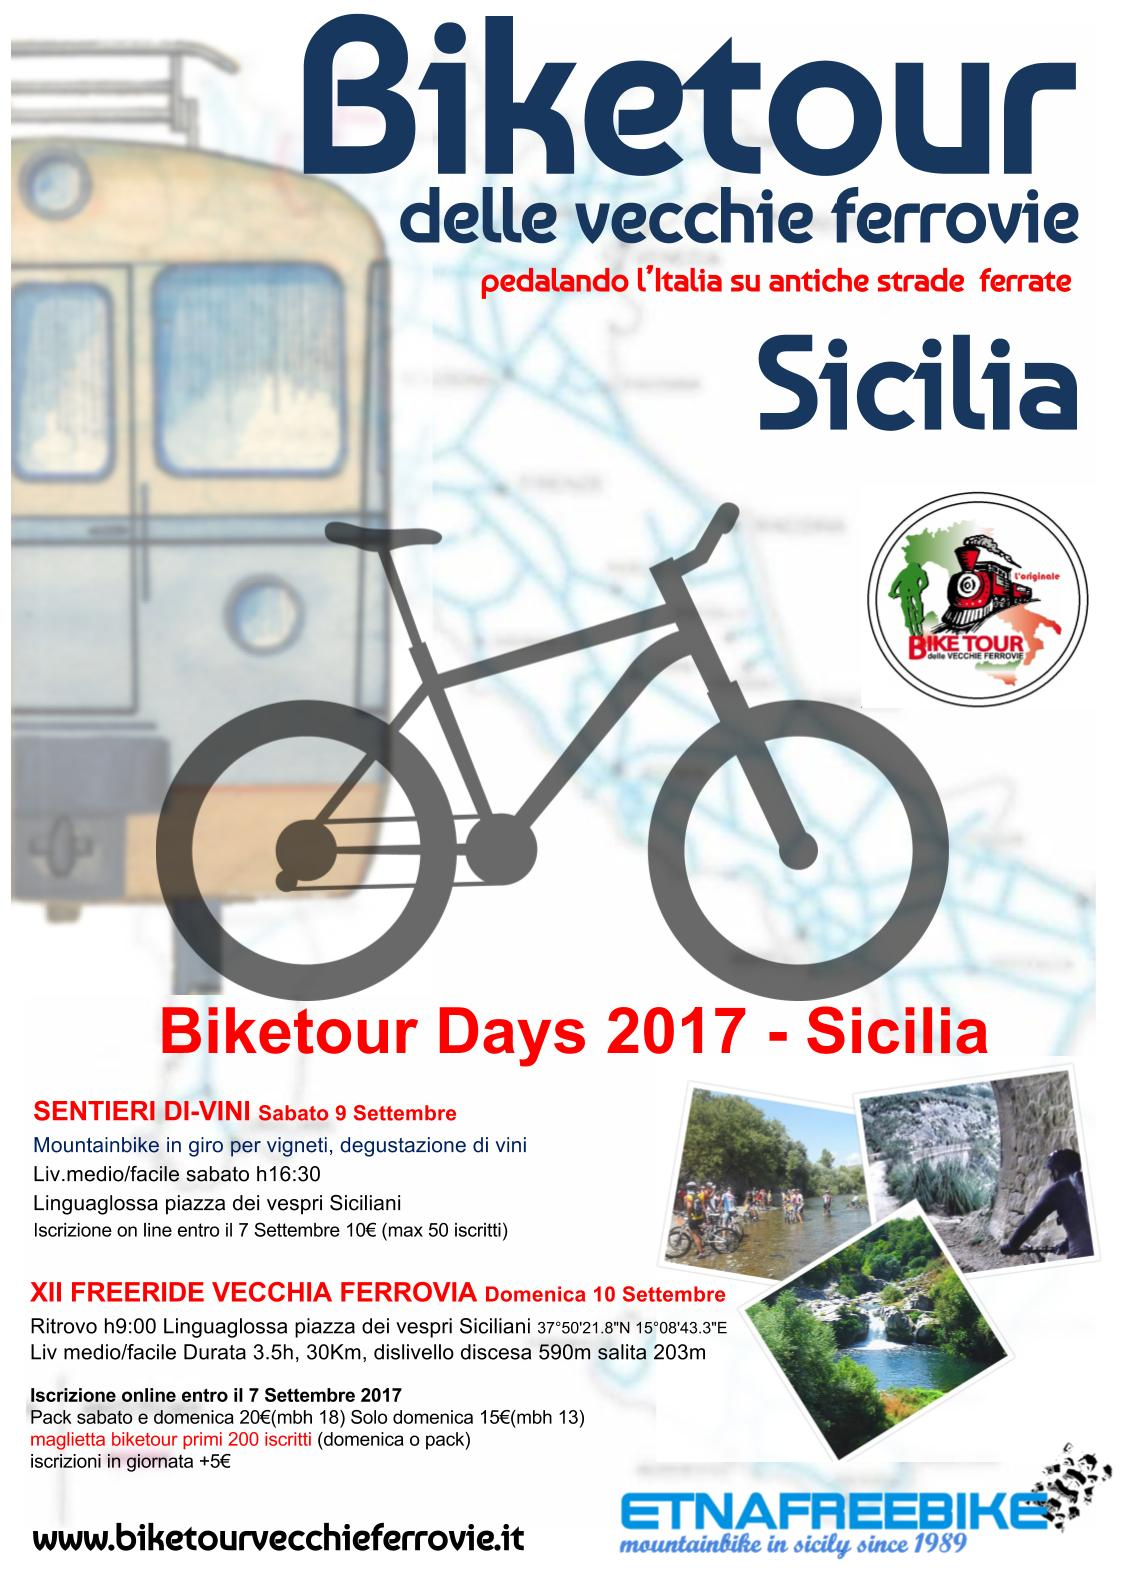 Locandina biketour 2017 - Sicilia